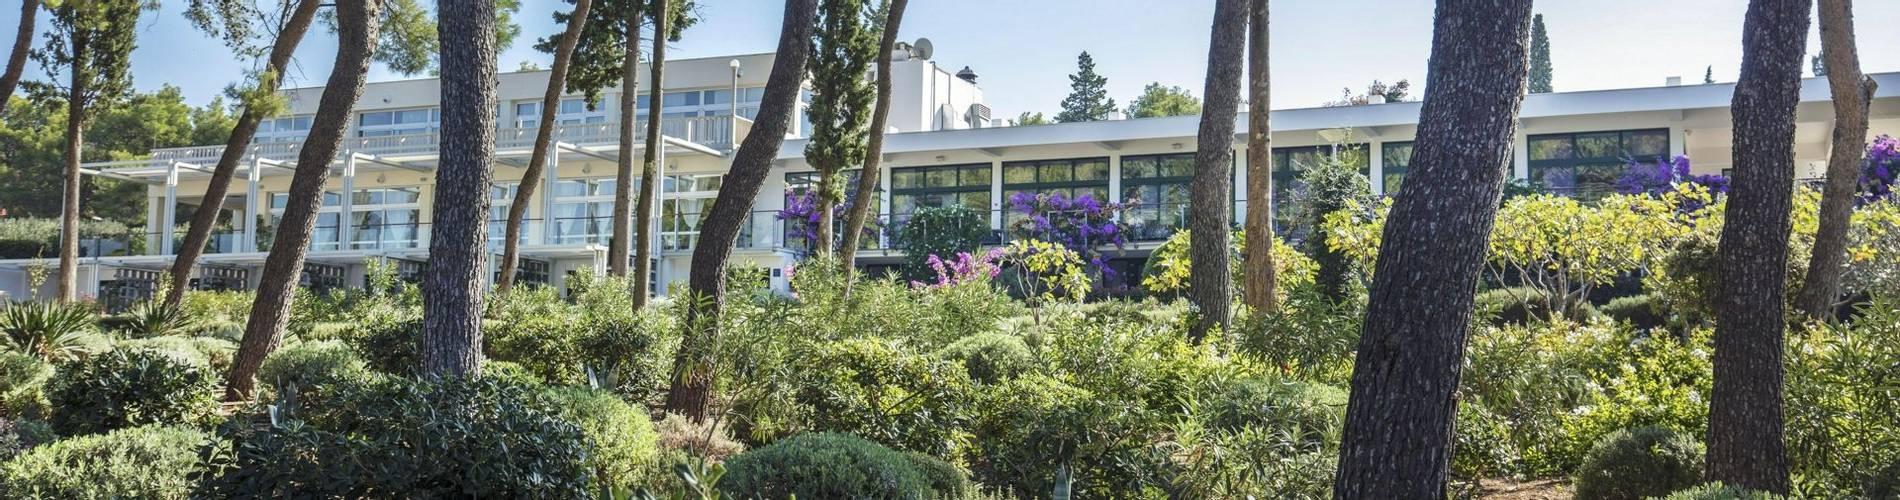 Resort_Velaris - Garden (7) (1).jpg